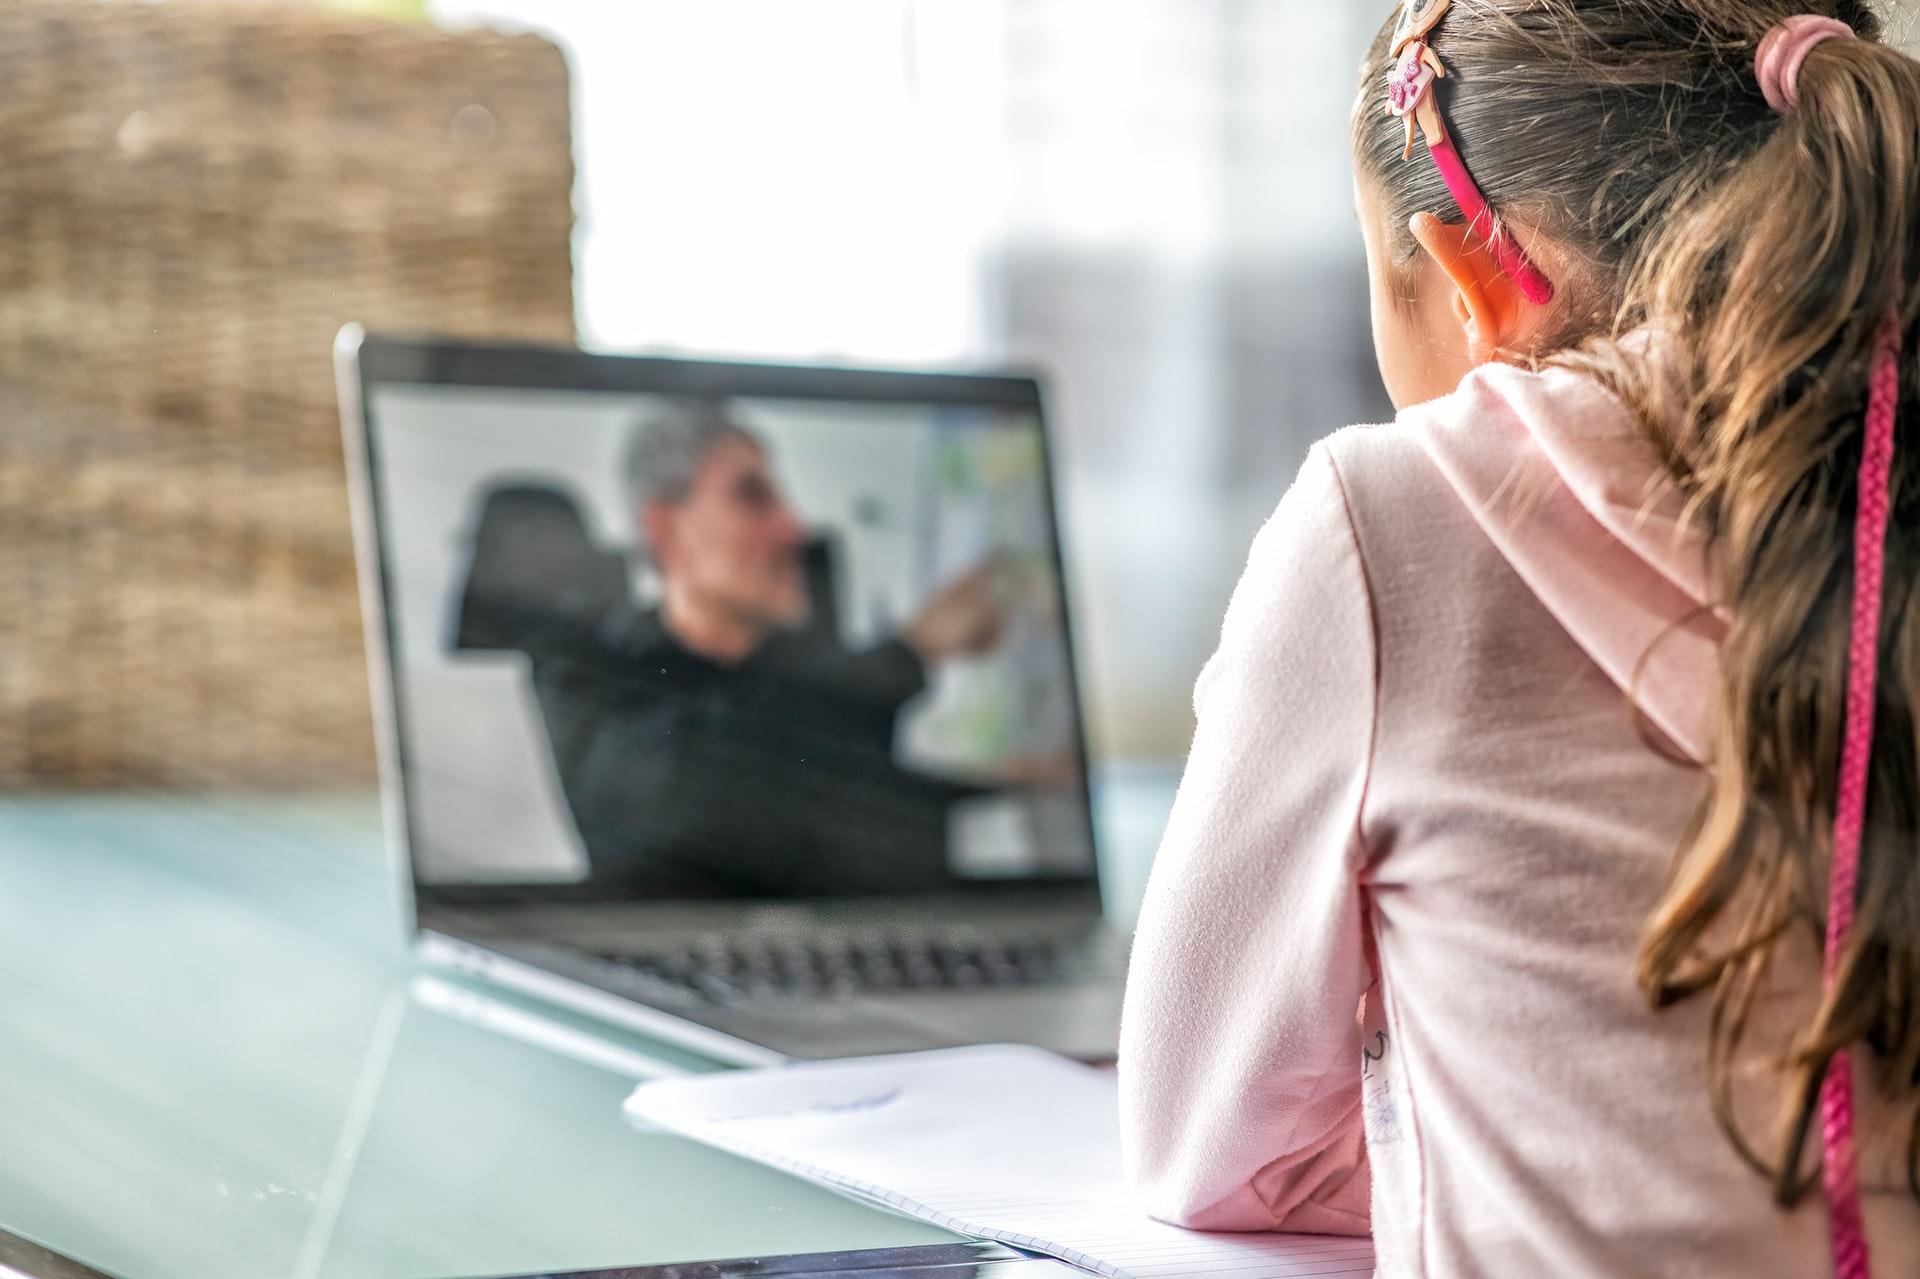 Girl listening online class on the laptop